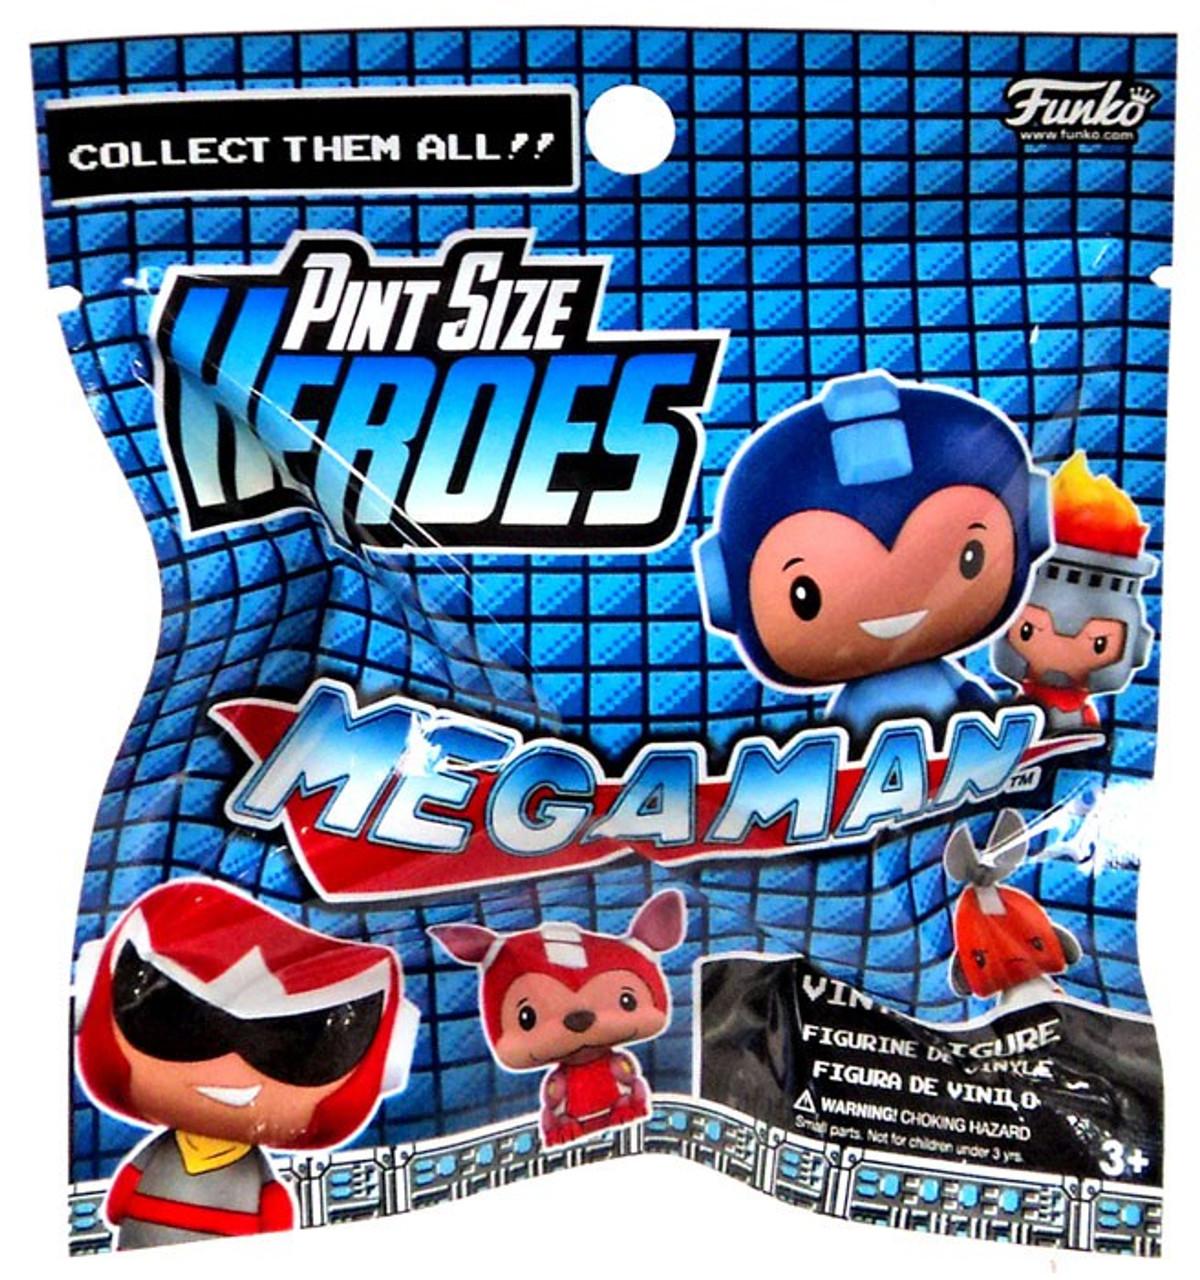 Funko Pint Size Heroes Mega Man Mystery Pack